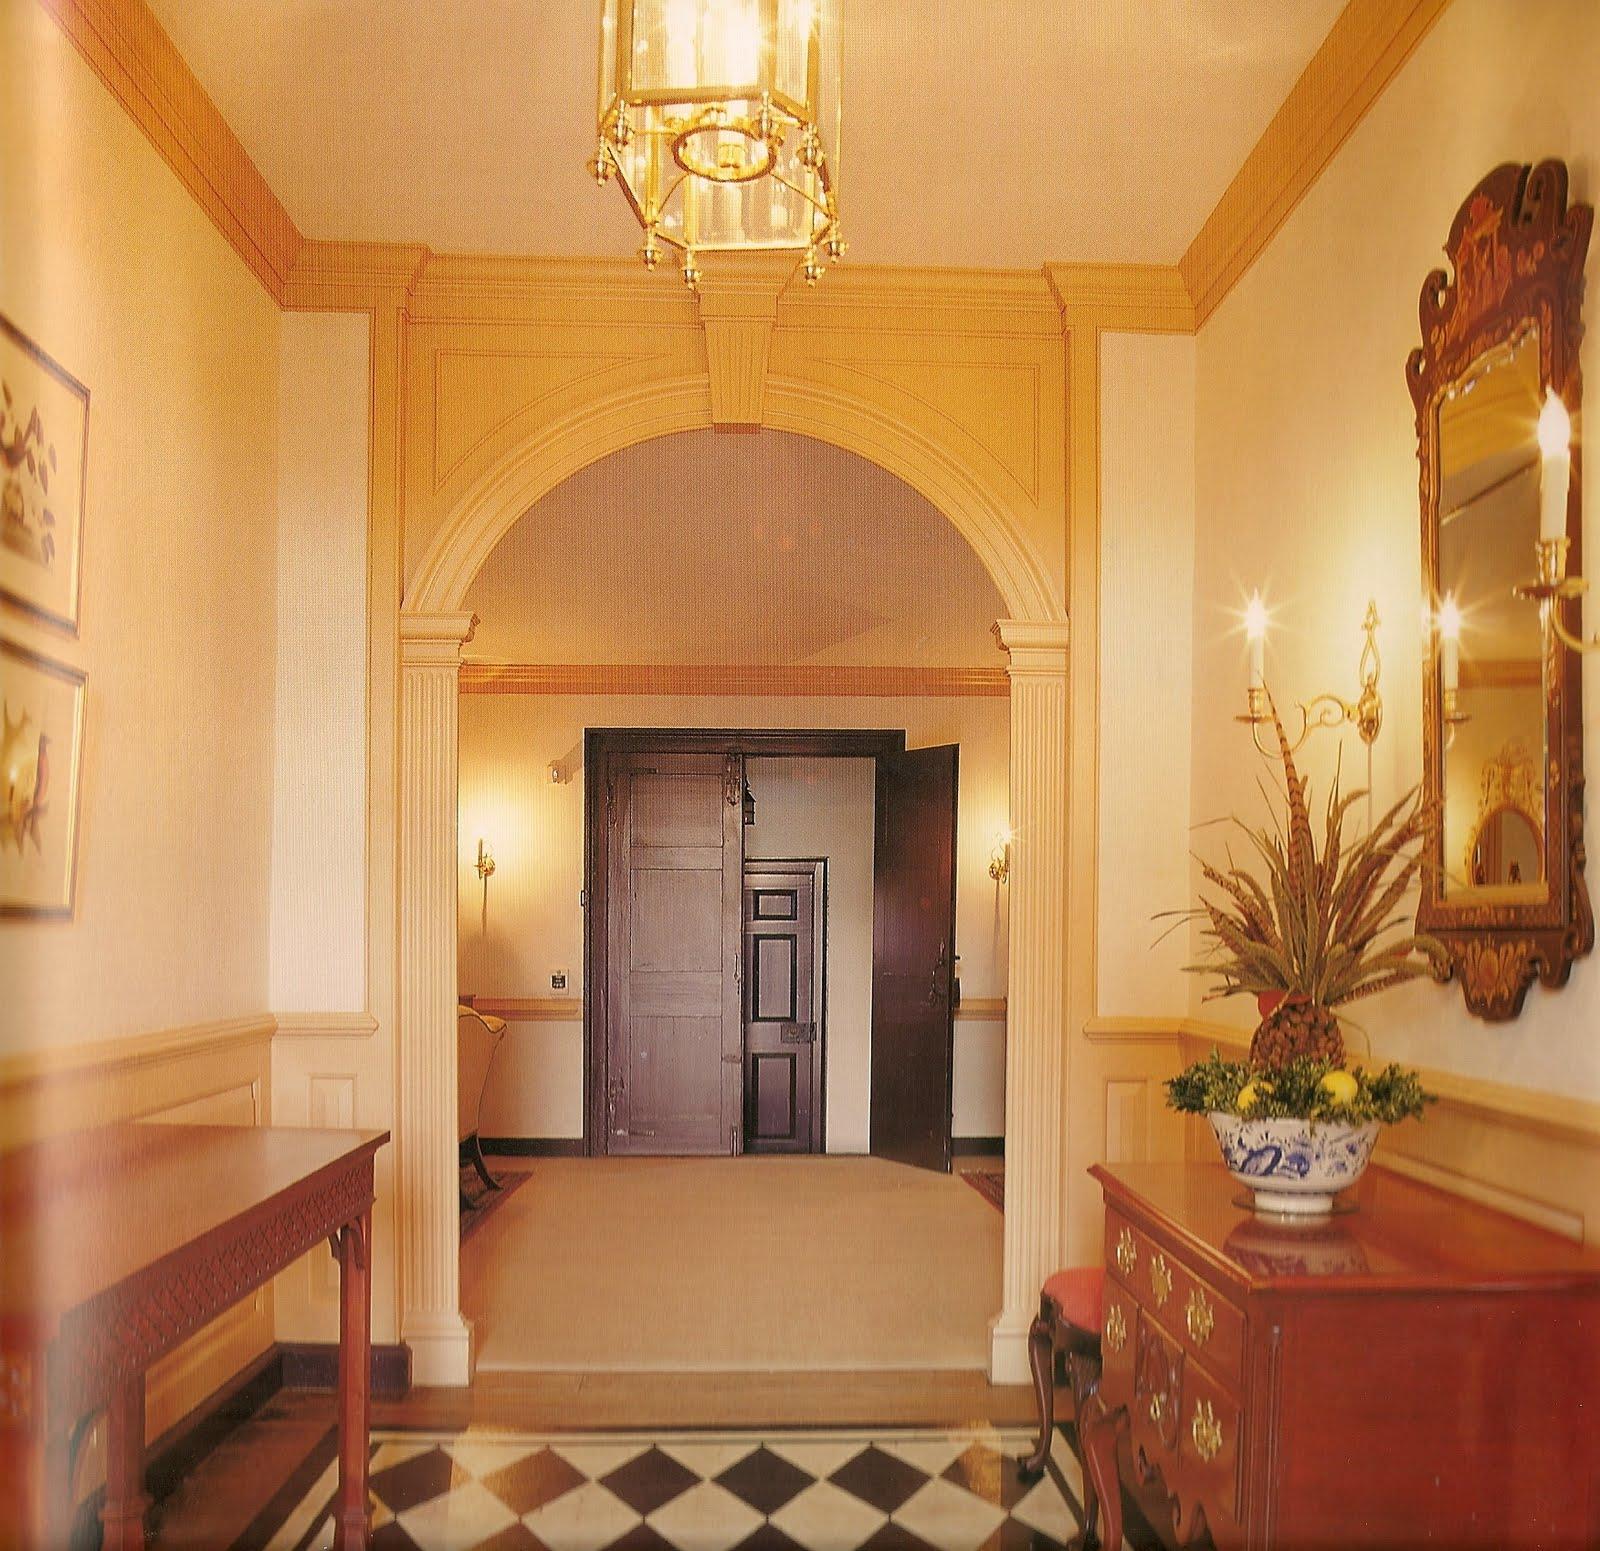 Interior Design Colonial Williamsburg: Long Island Style: Colonial Williamsburg...Truly Classic